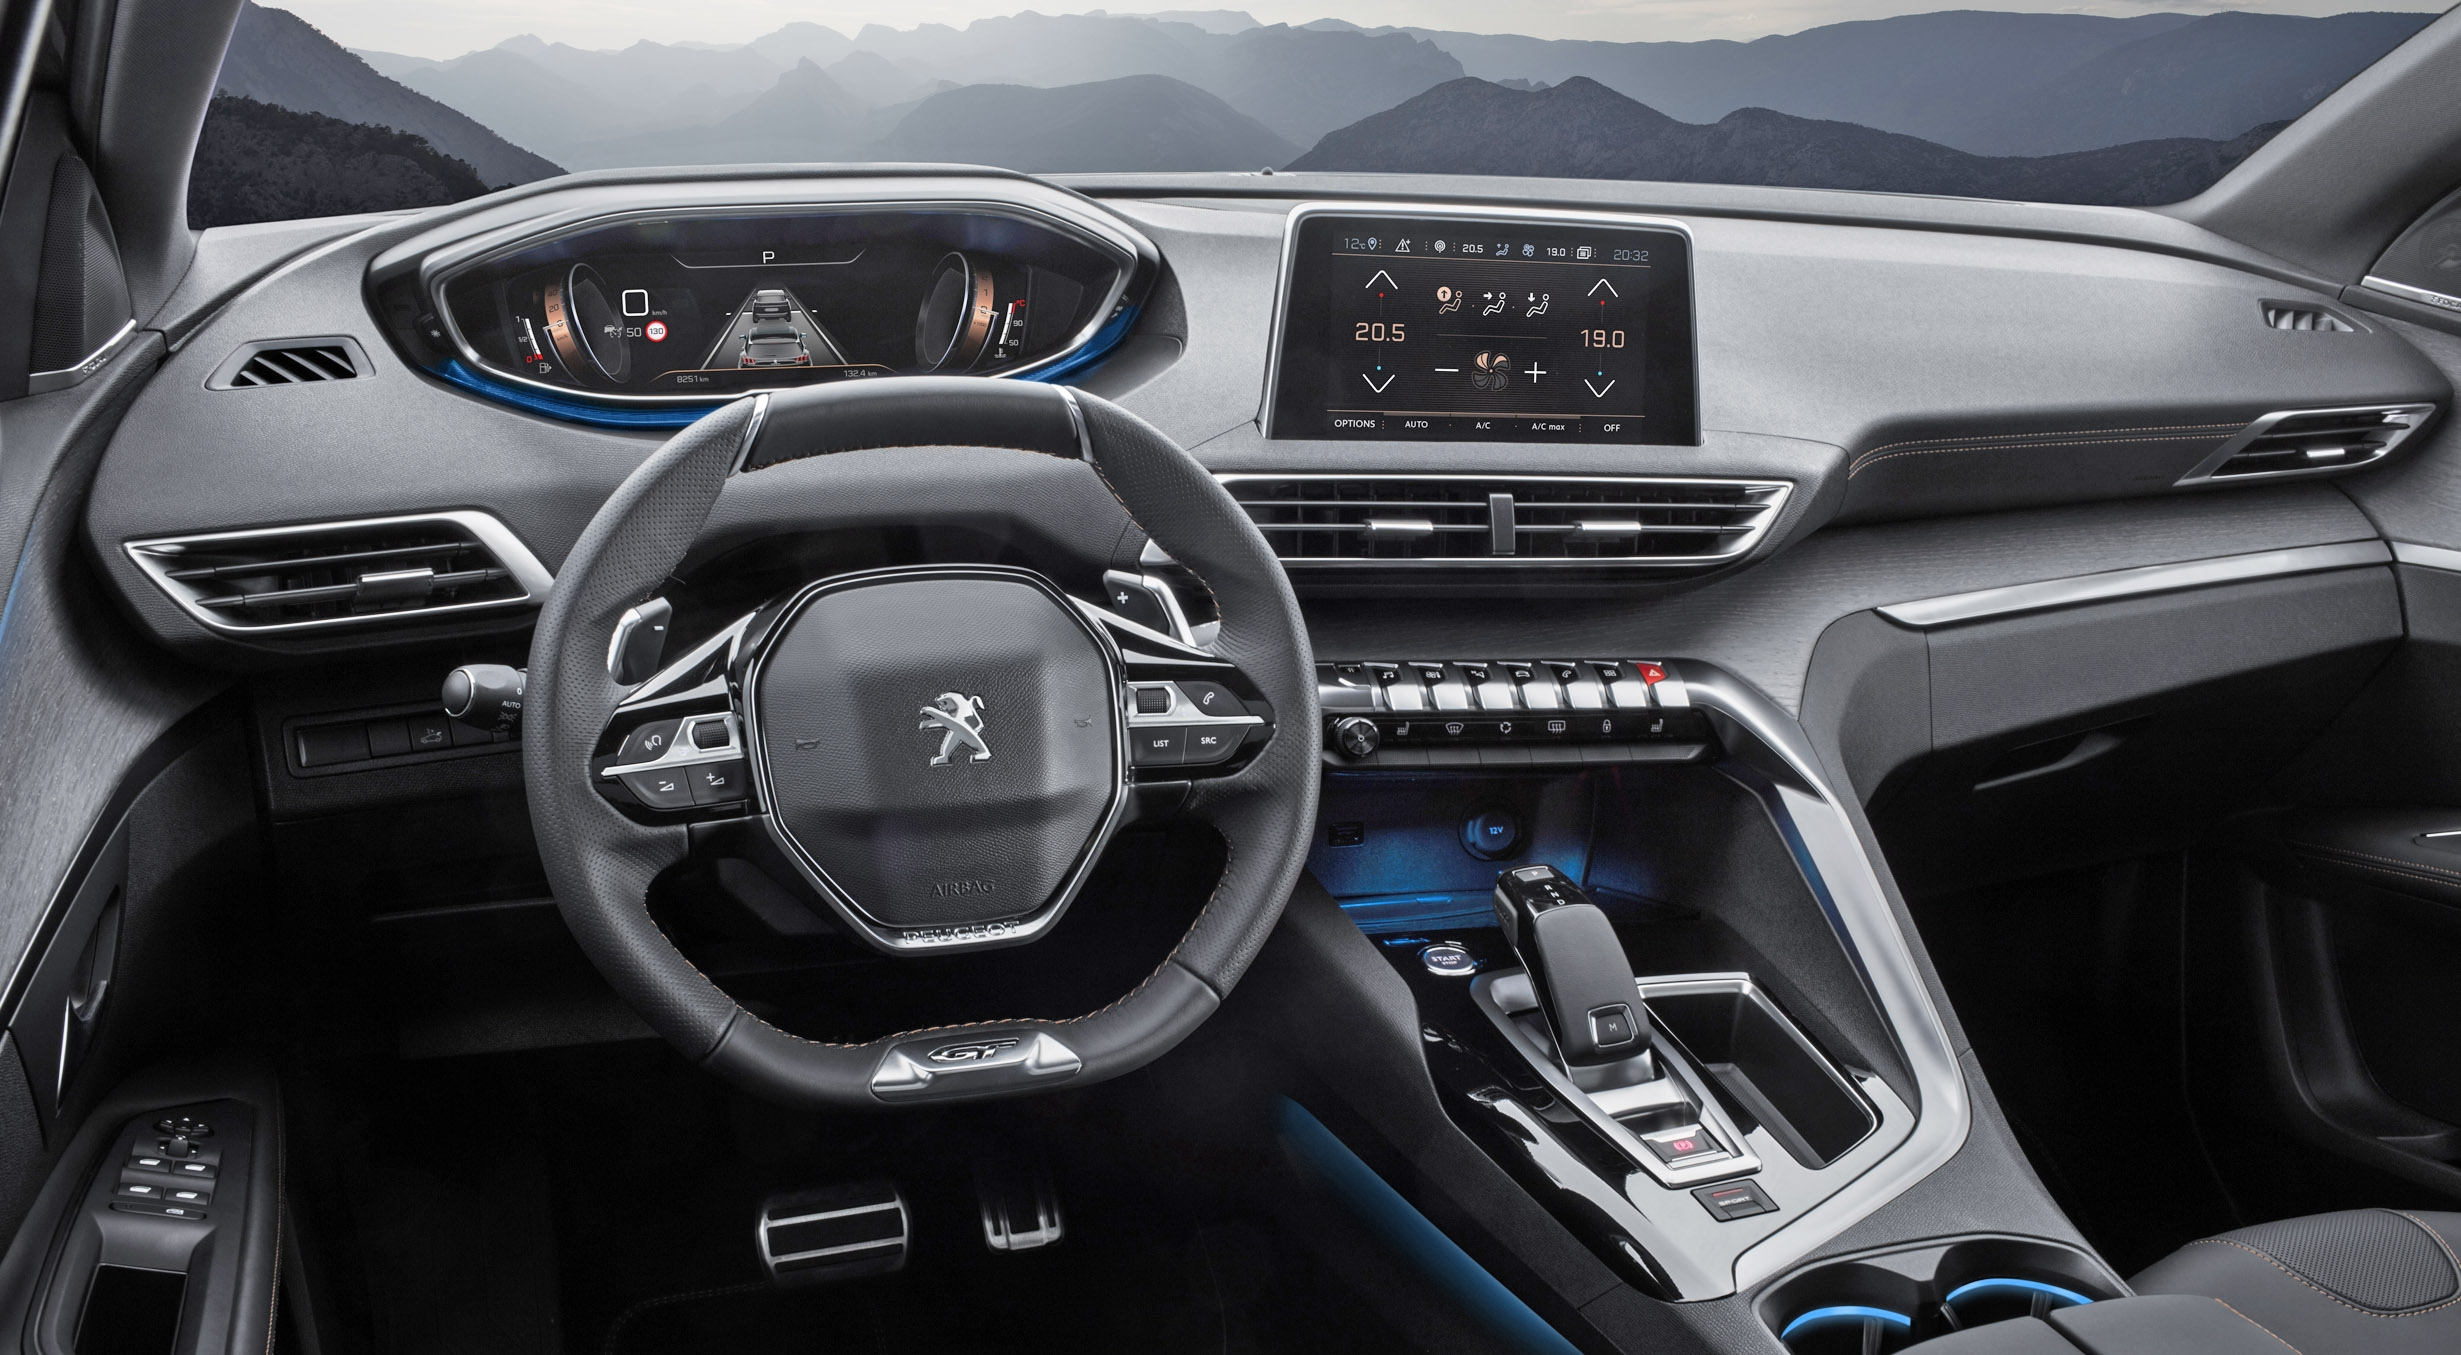 2018 Diesel Suv >> Quelle Peugeot 3008 choisir